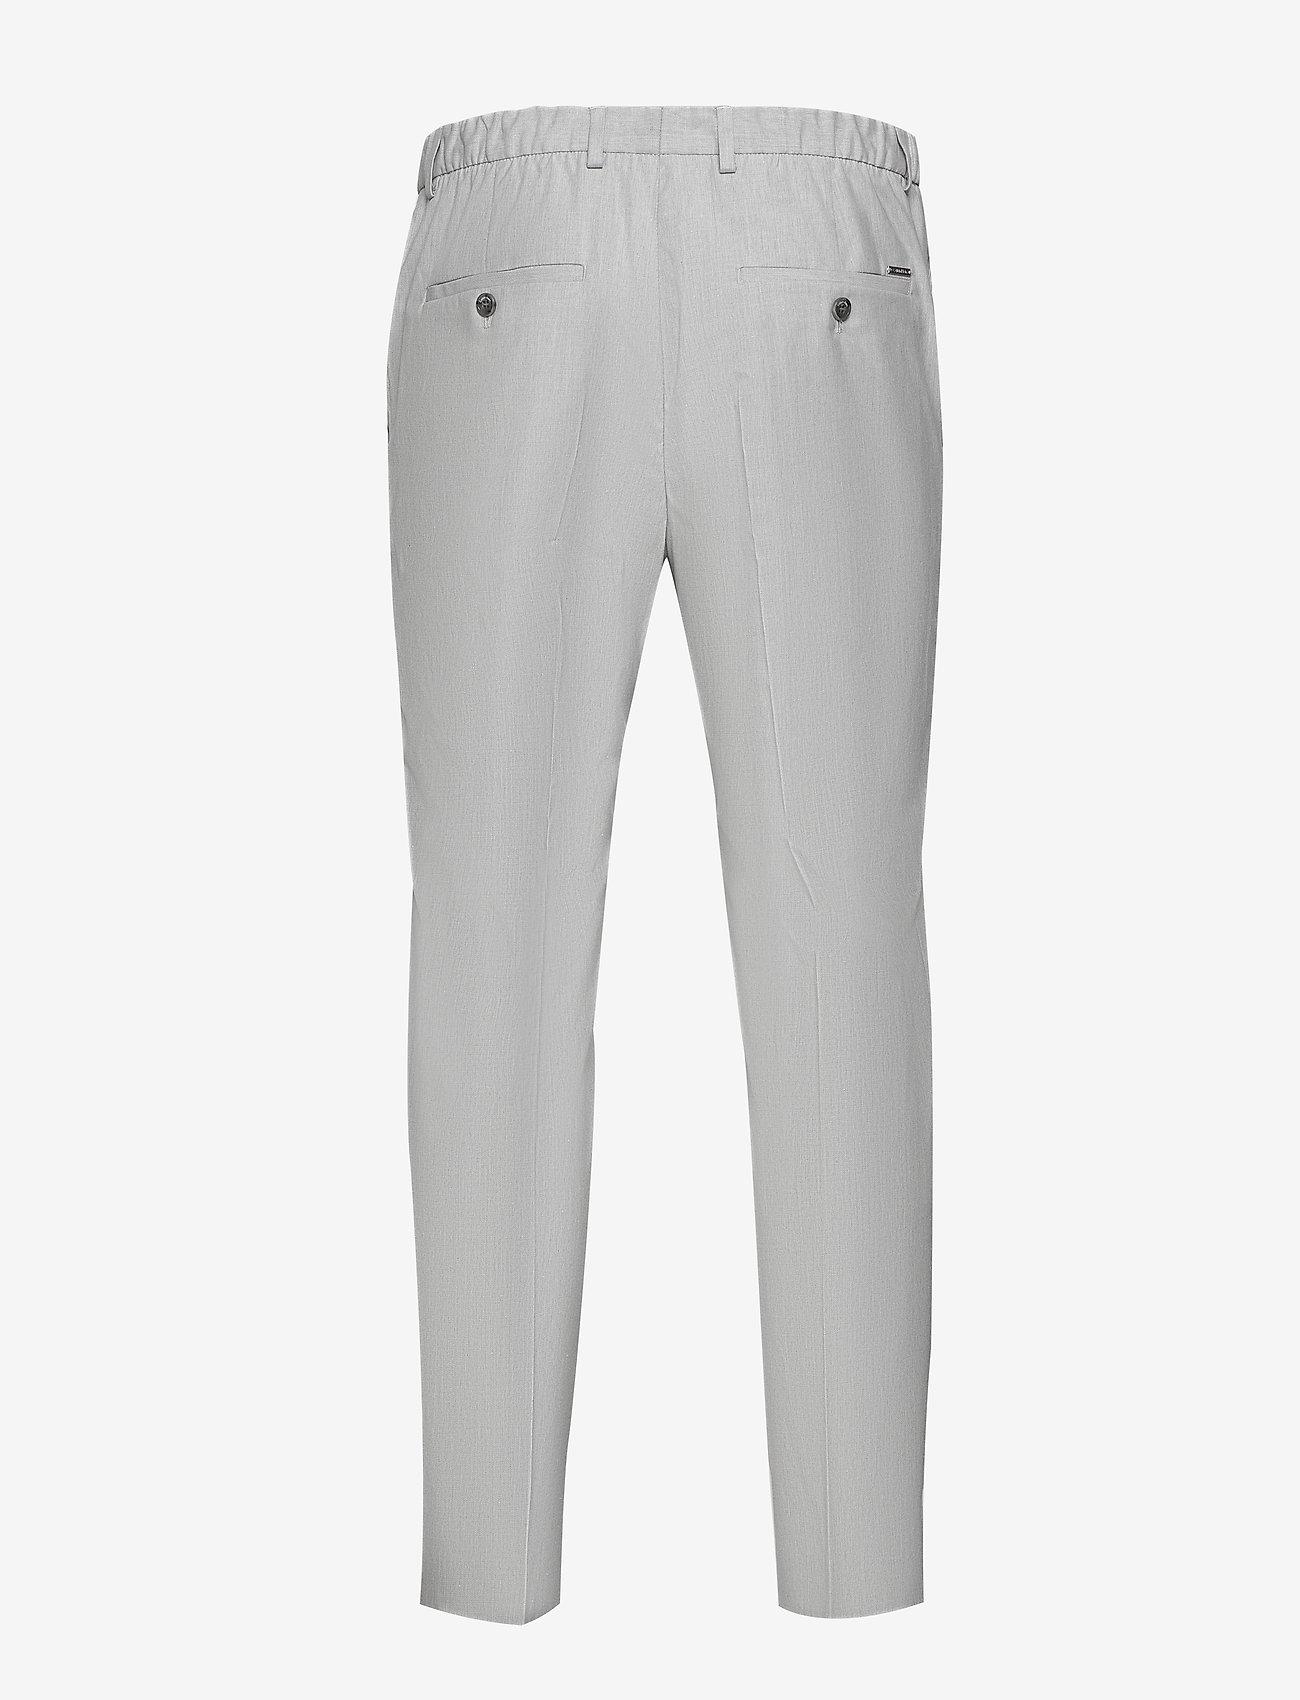 Summer Chambray Pant (Light Grey Heather) - Calvin Klein sYKmOa